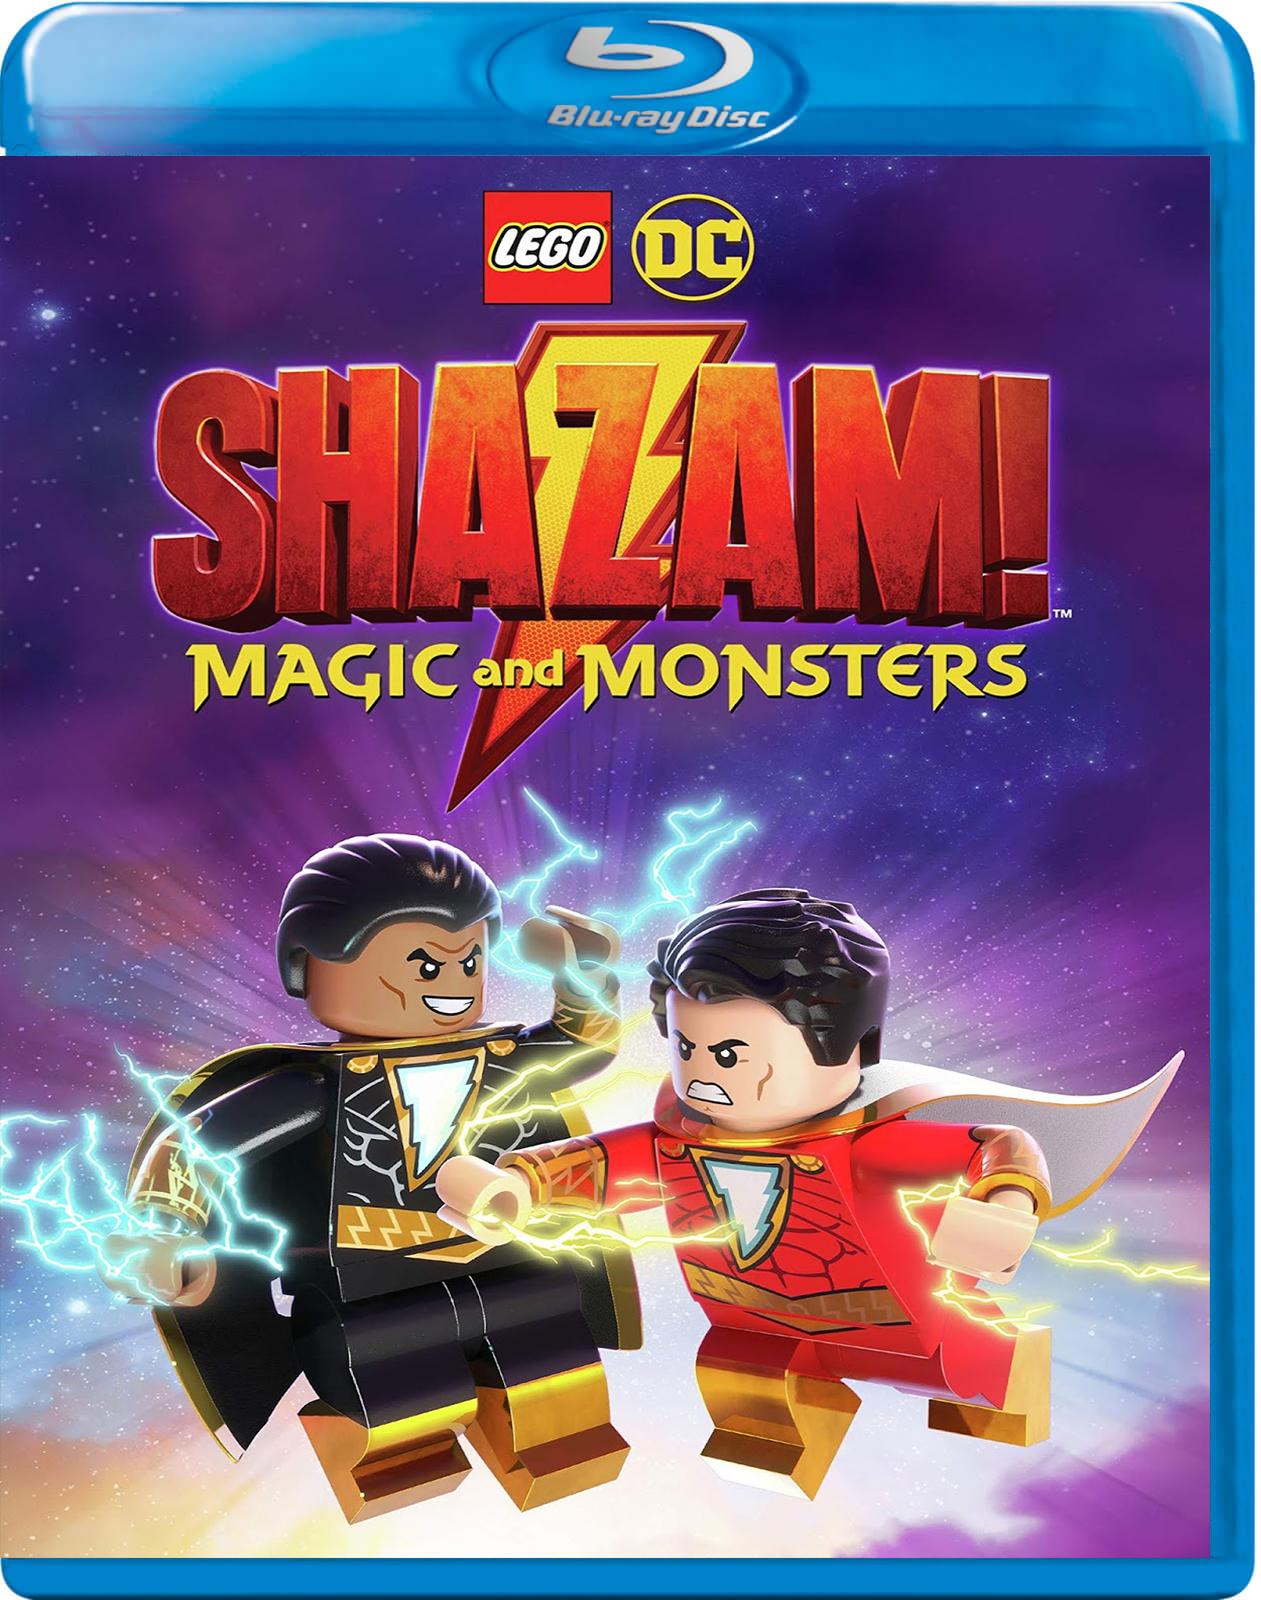 Lego DC: Shazam!: Magic and Monsters [2020] [BD25] [Latino]